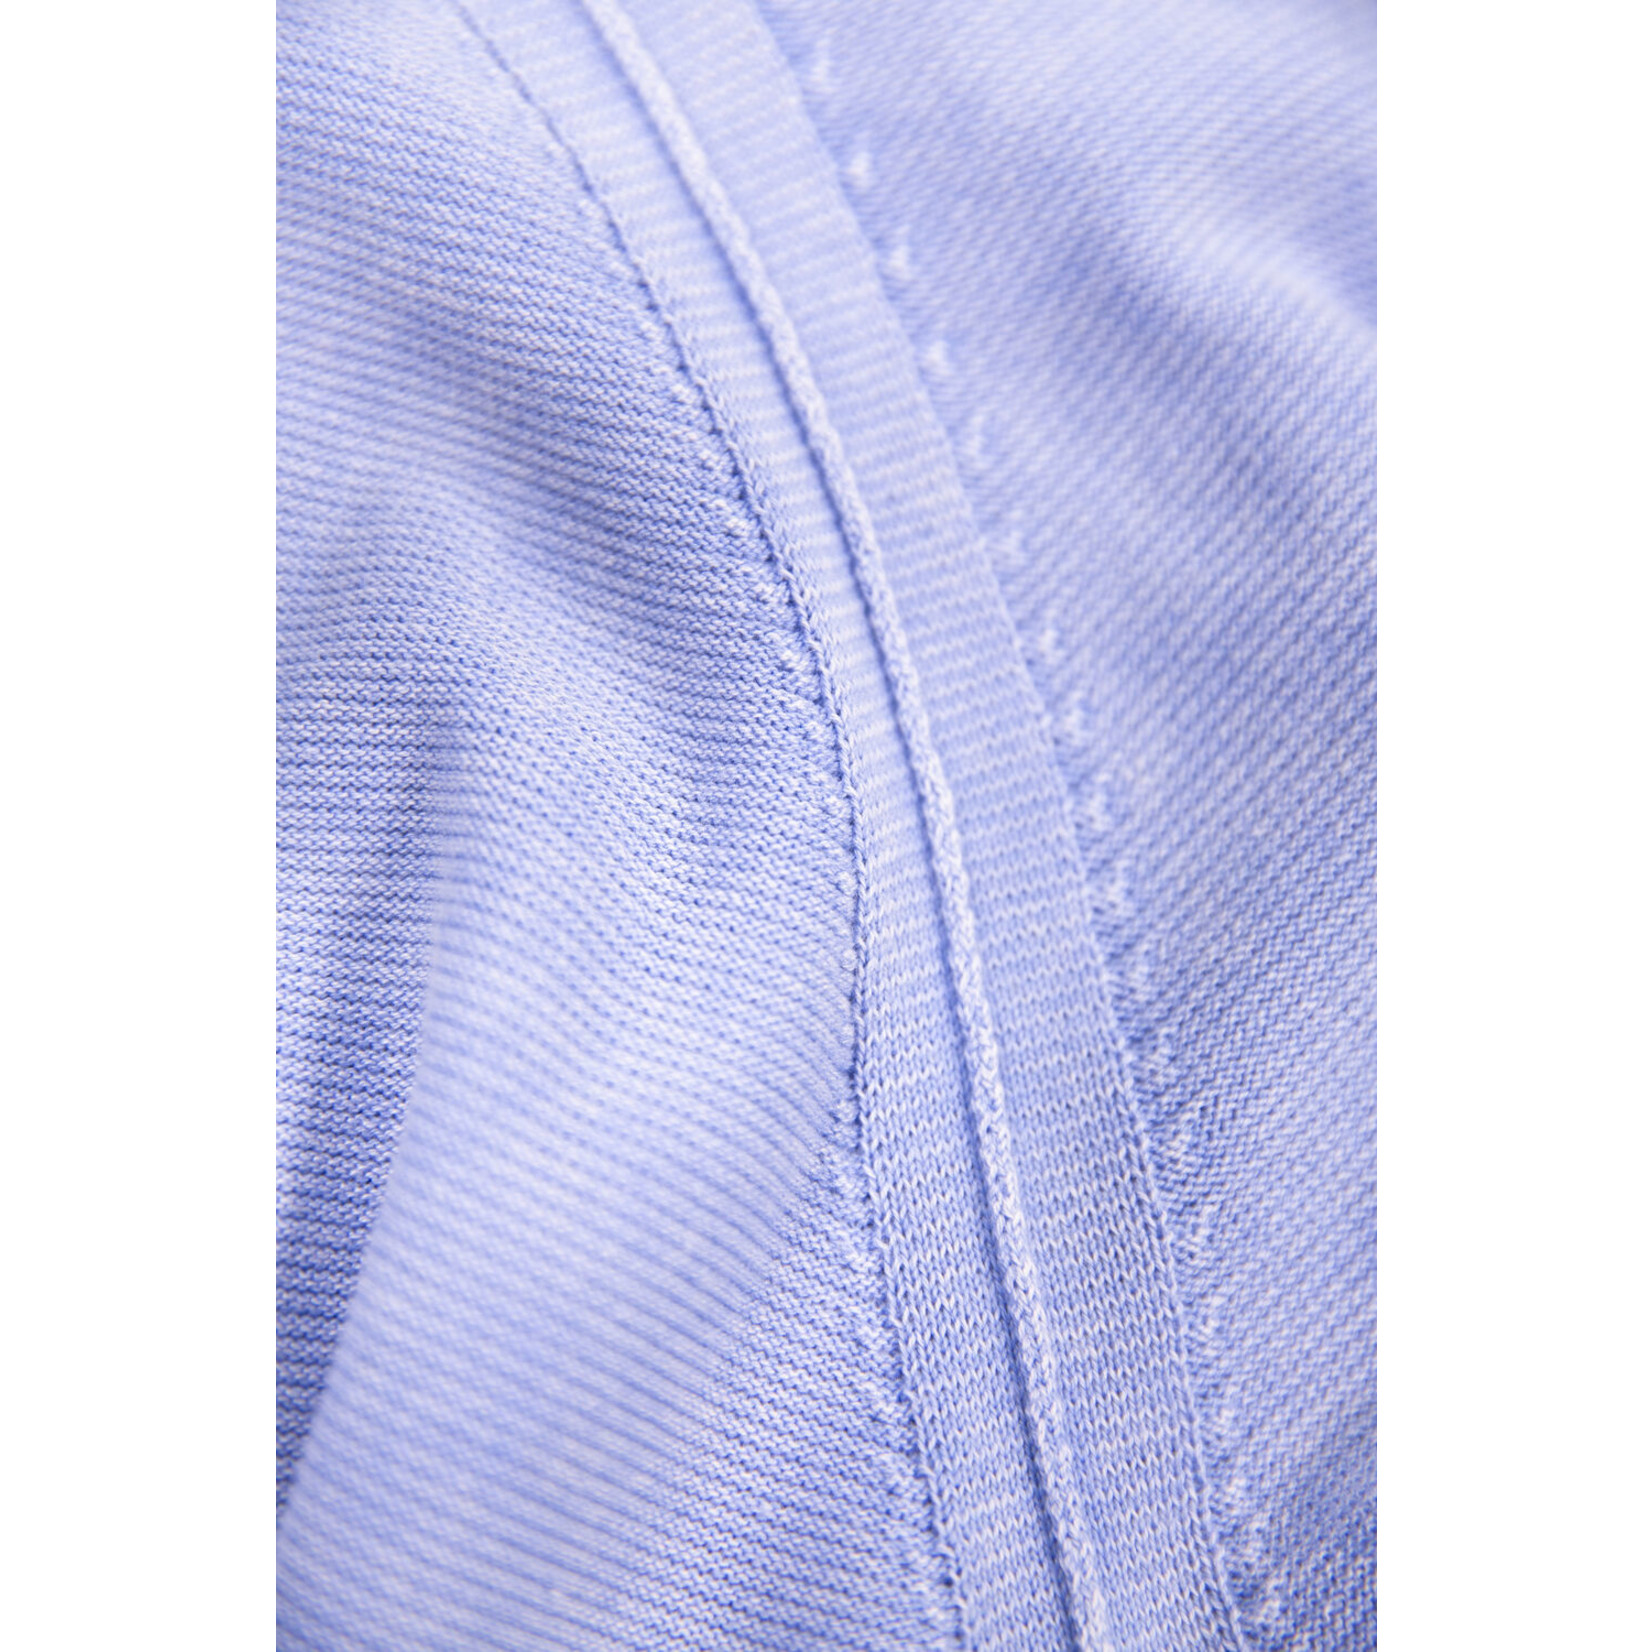 Garcia Garcia B11240 Light-Weight Knit Pullover